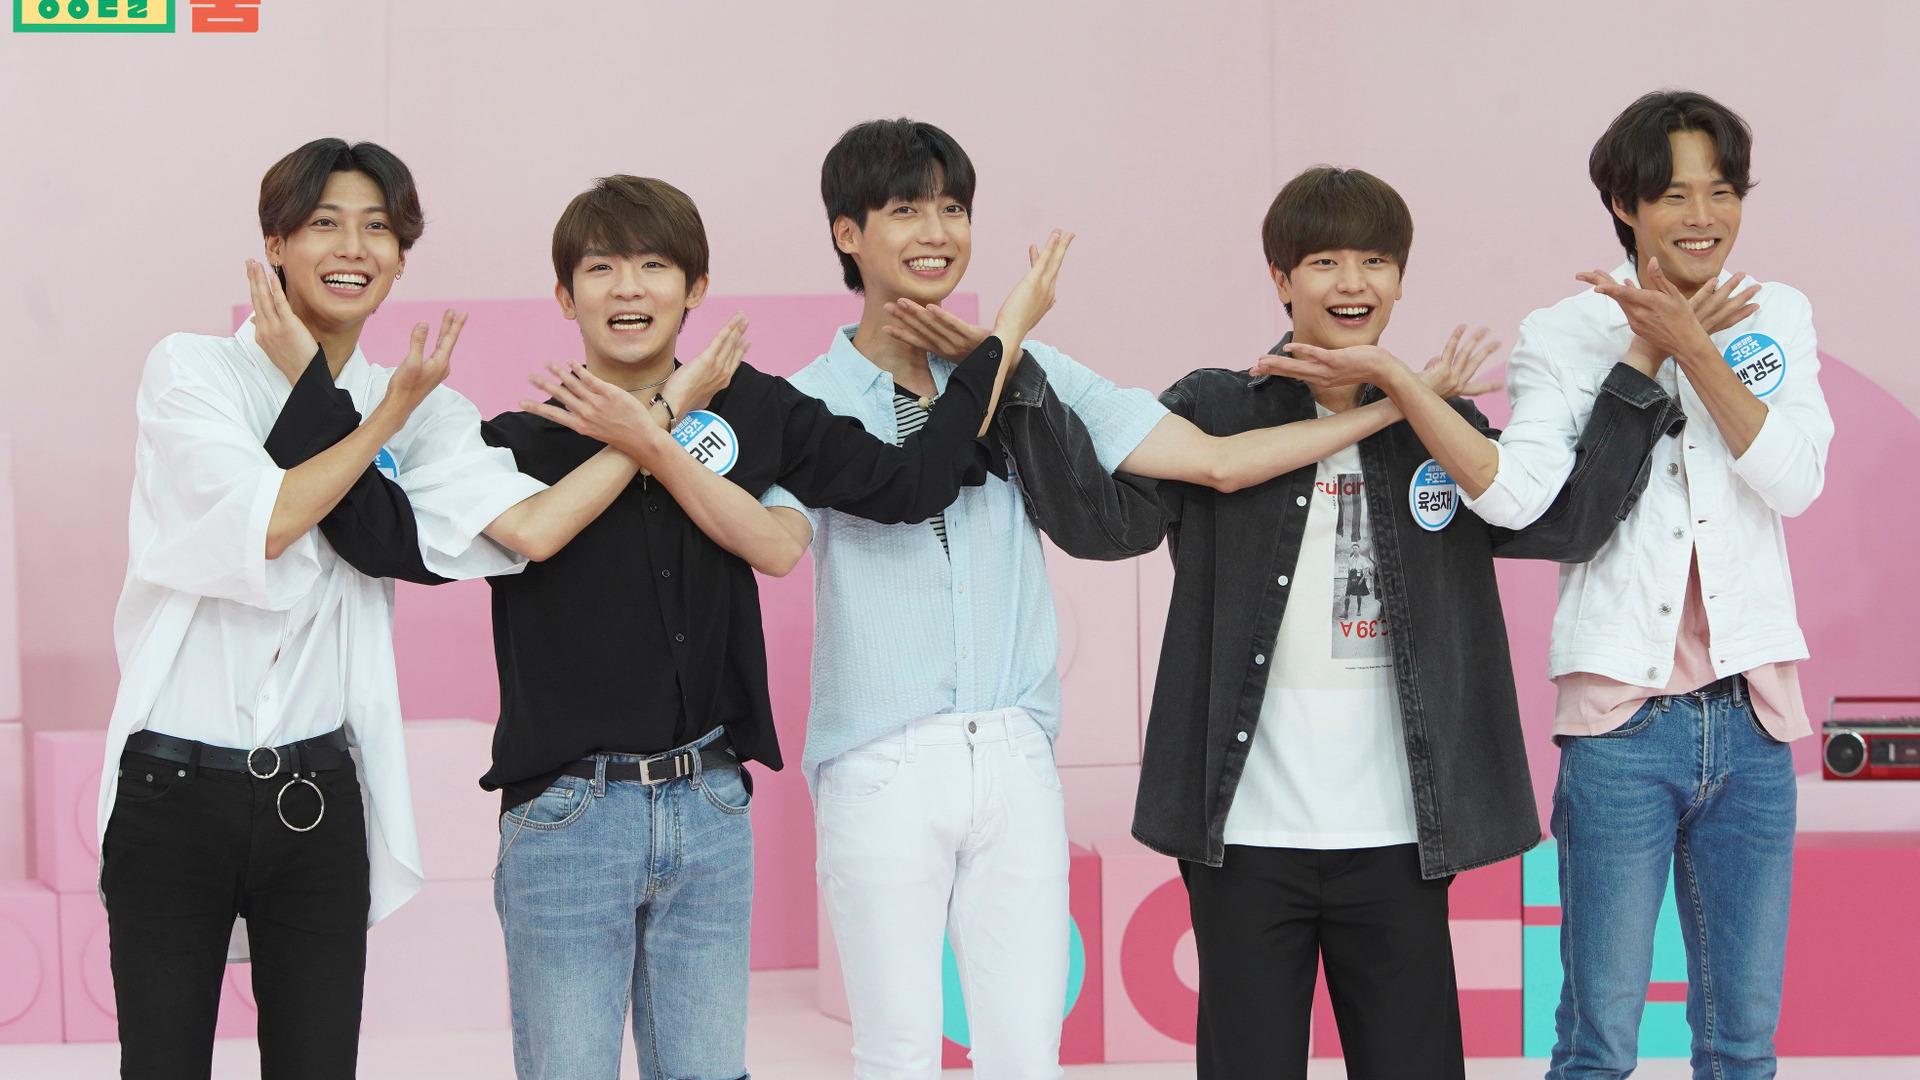 Idol Room — s02e31 — Pretty 95s (Yook Sung-jae (BtoB), Ricky (Teen Top), Jo Young-min, Jo Kwang-min, Baek Kyung-do)